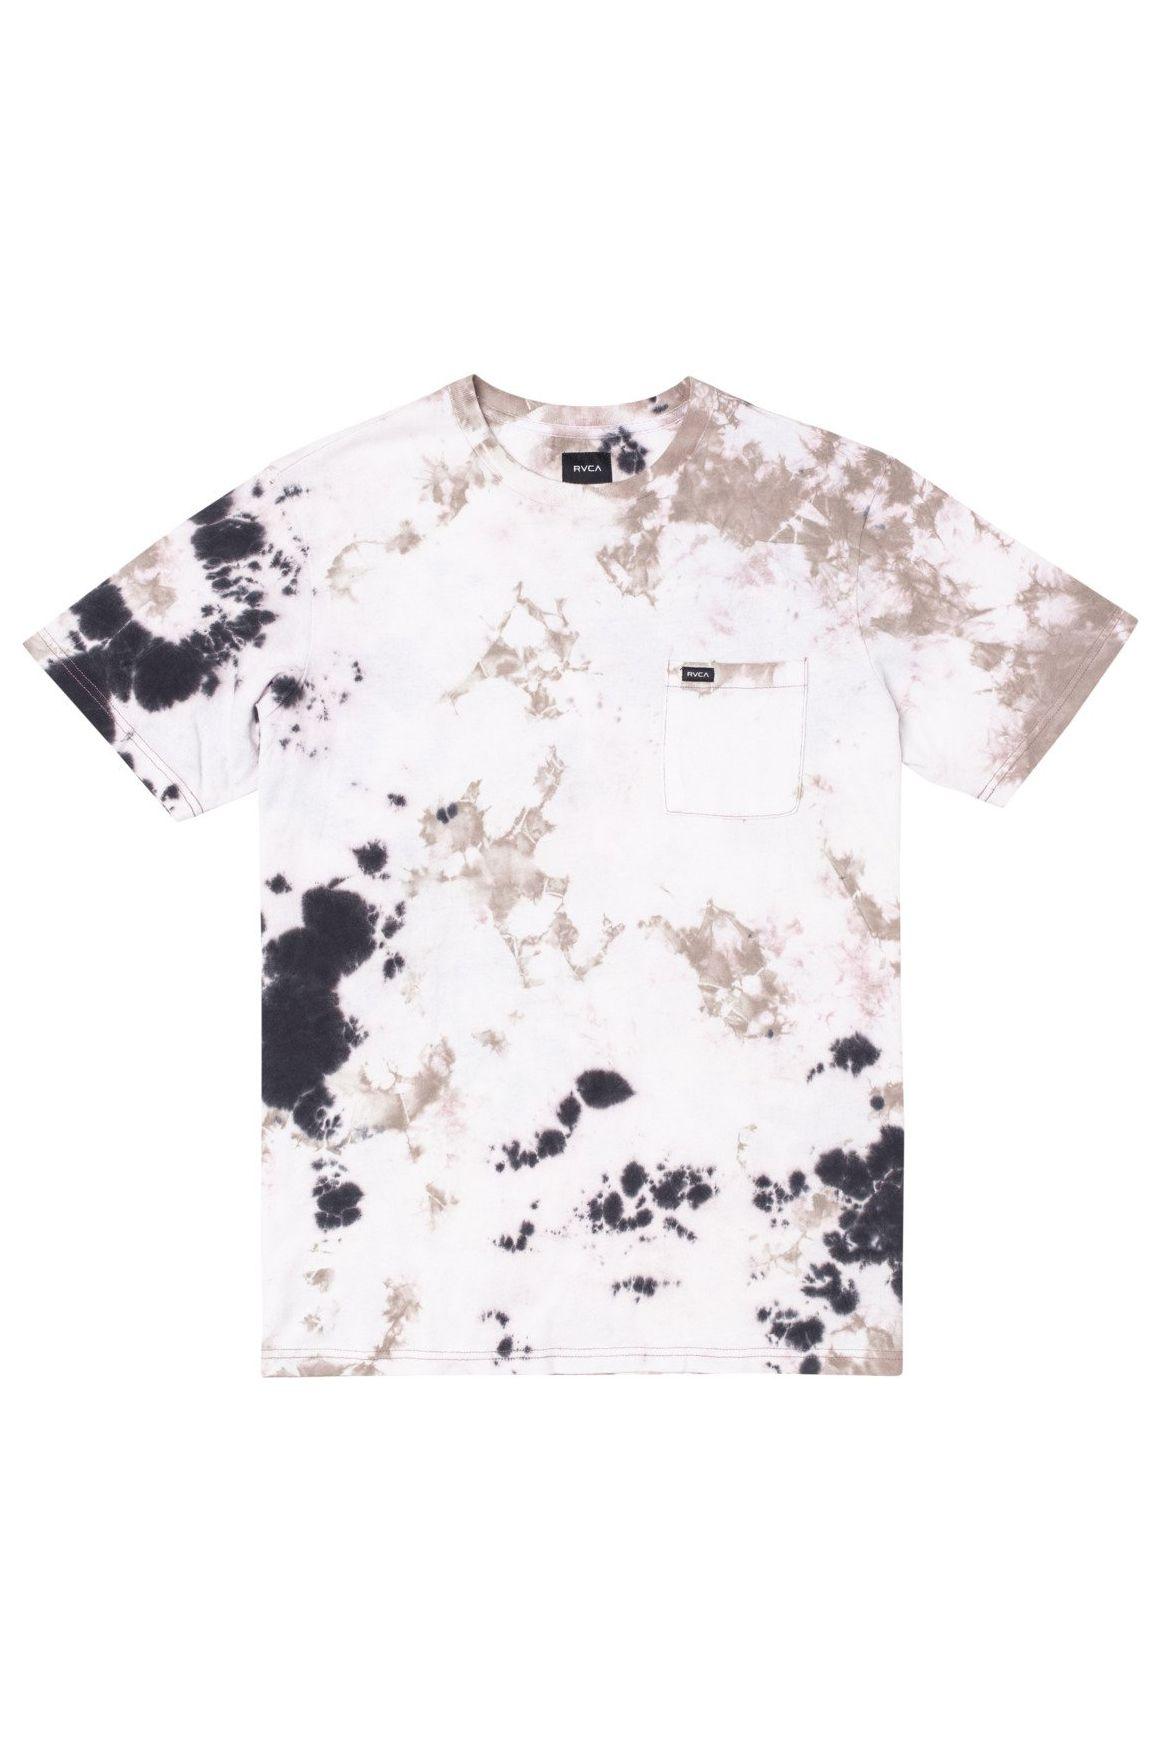 T-Shirt RVCA MANIC TIE DYE CREW Pale Mauve